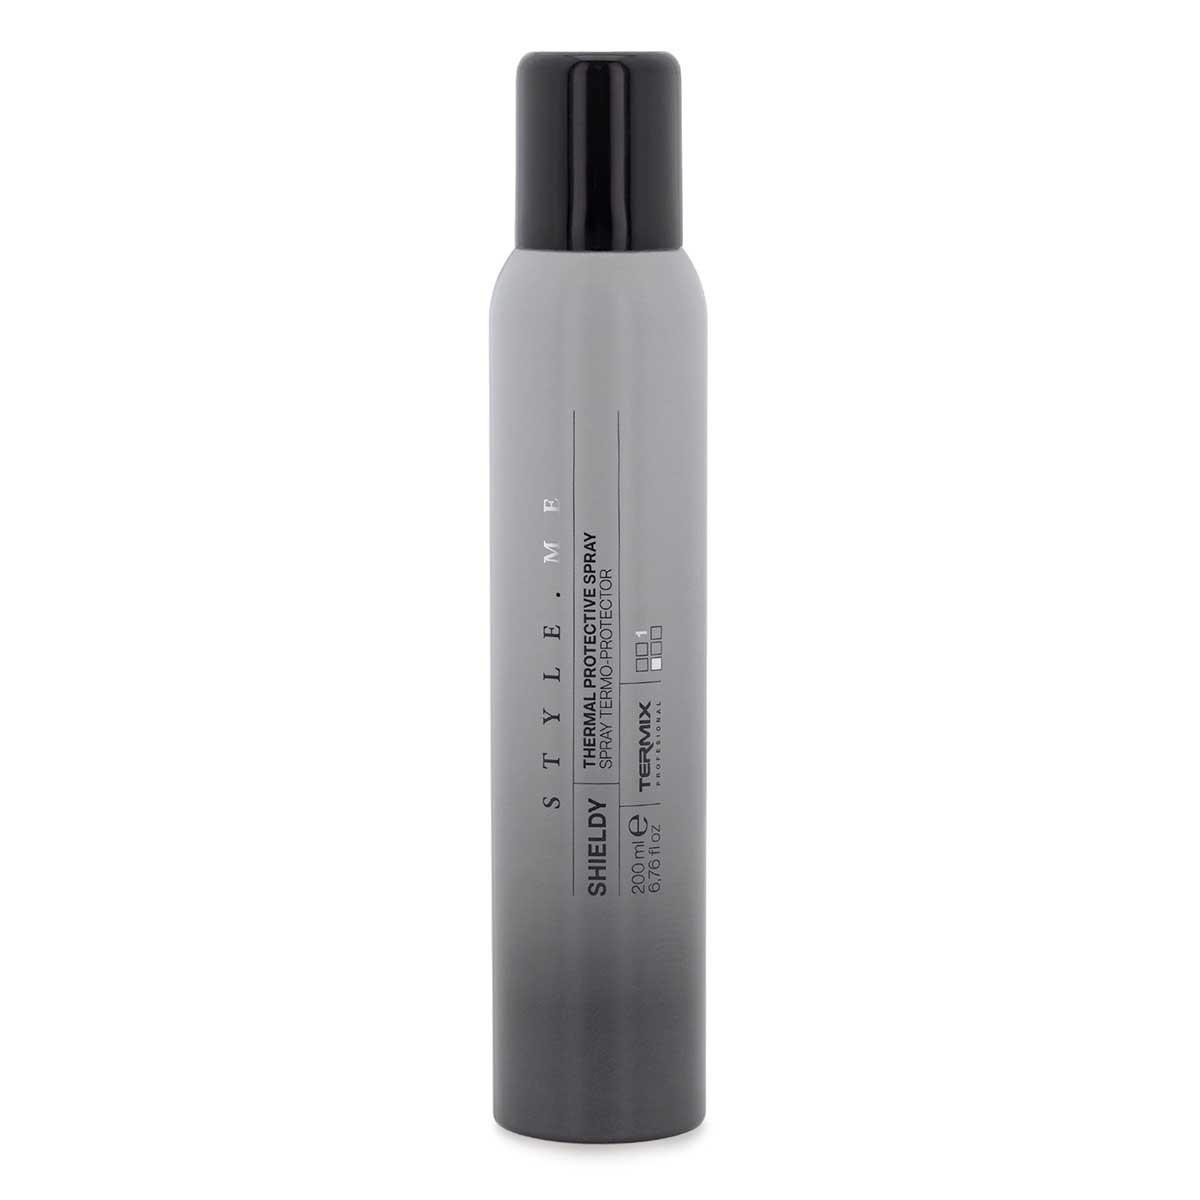 spray protector Style.Me.Shieldy